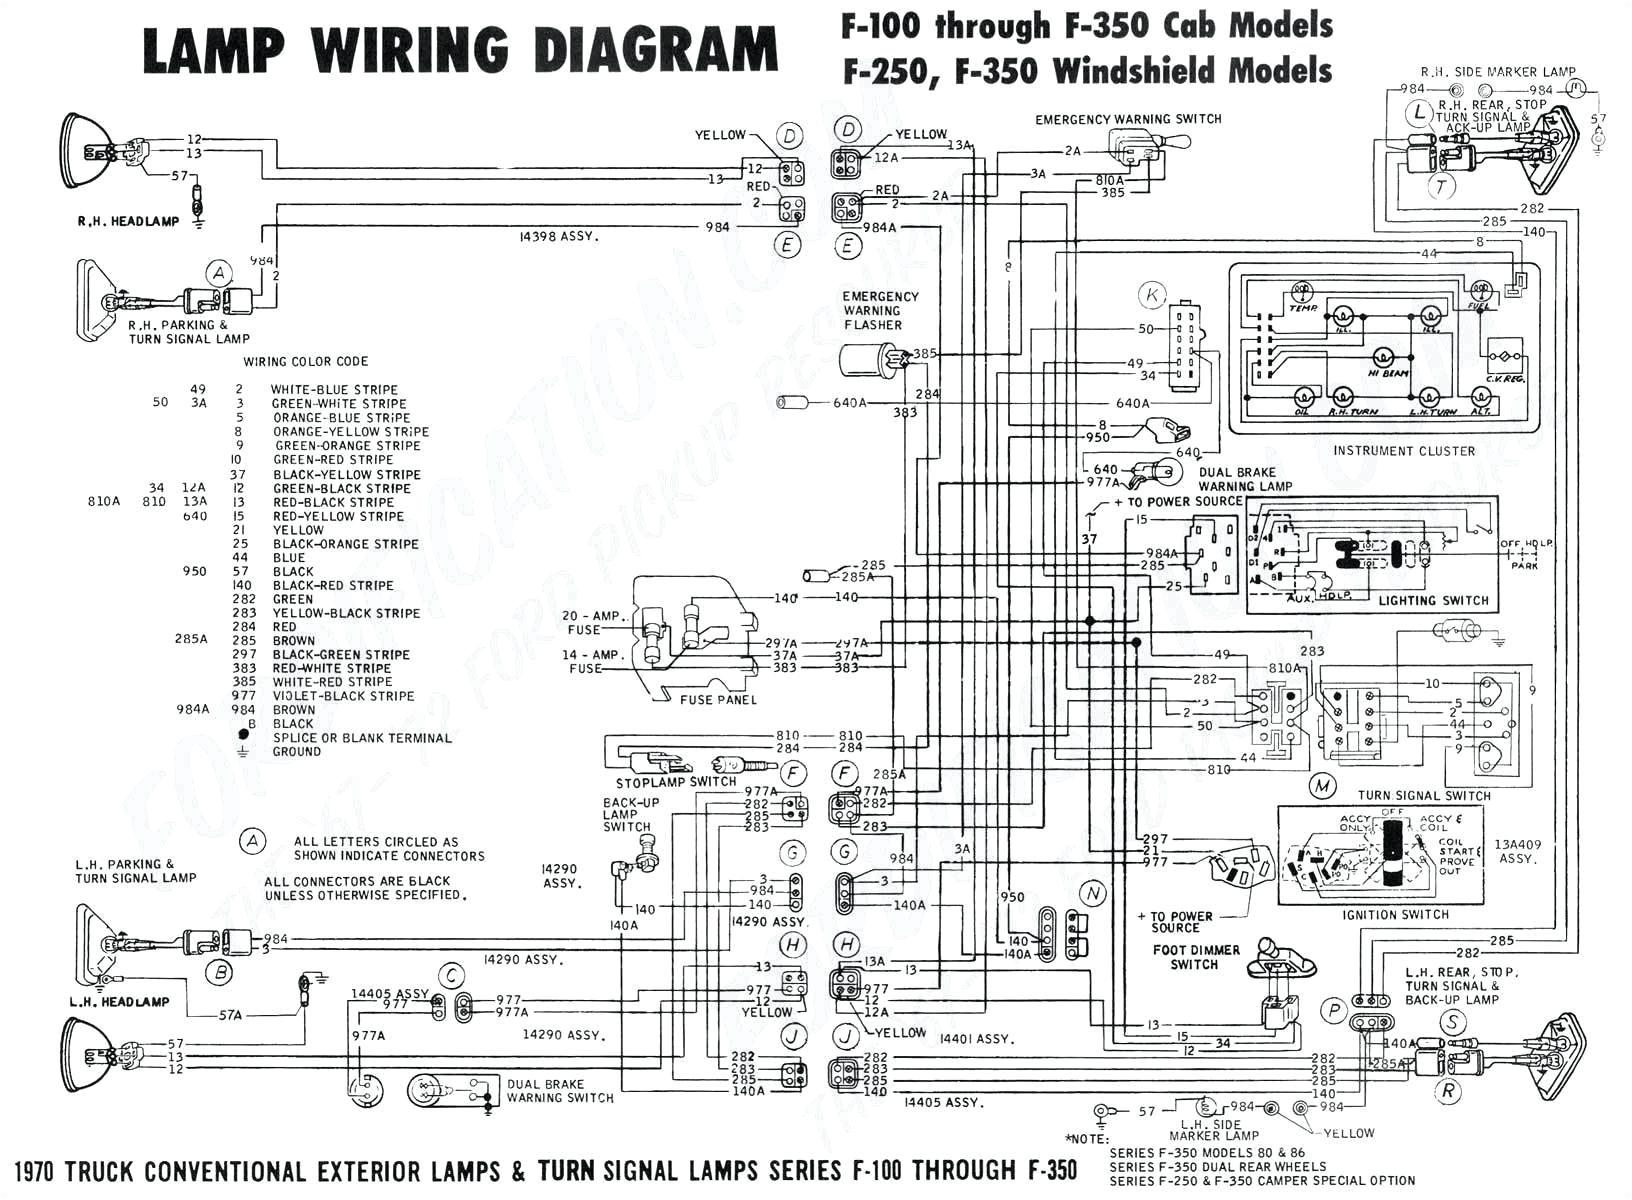 flasher fuse diagram 2006 kia sportage advance wiring diagram 2002 ford windstar ignition wiring diagram wiring